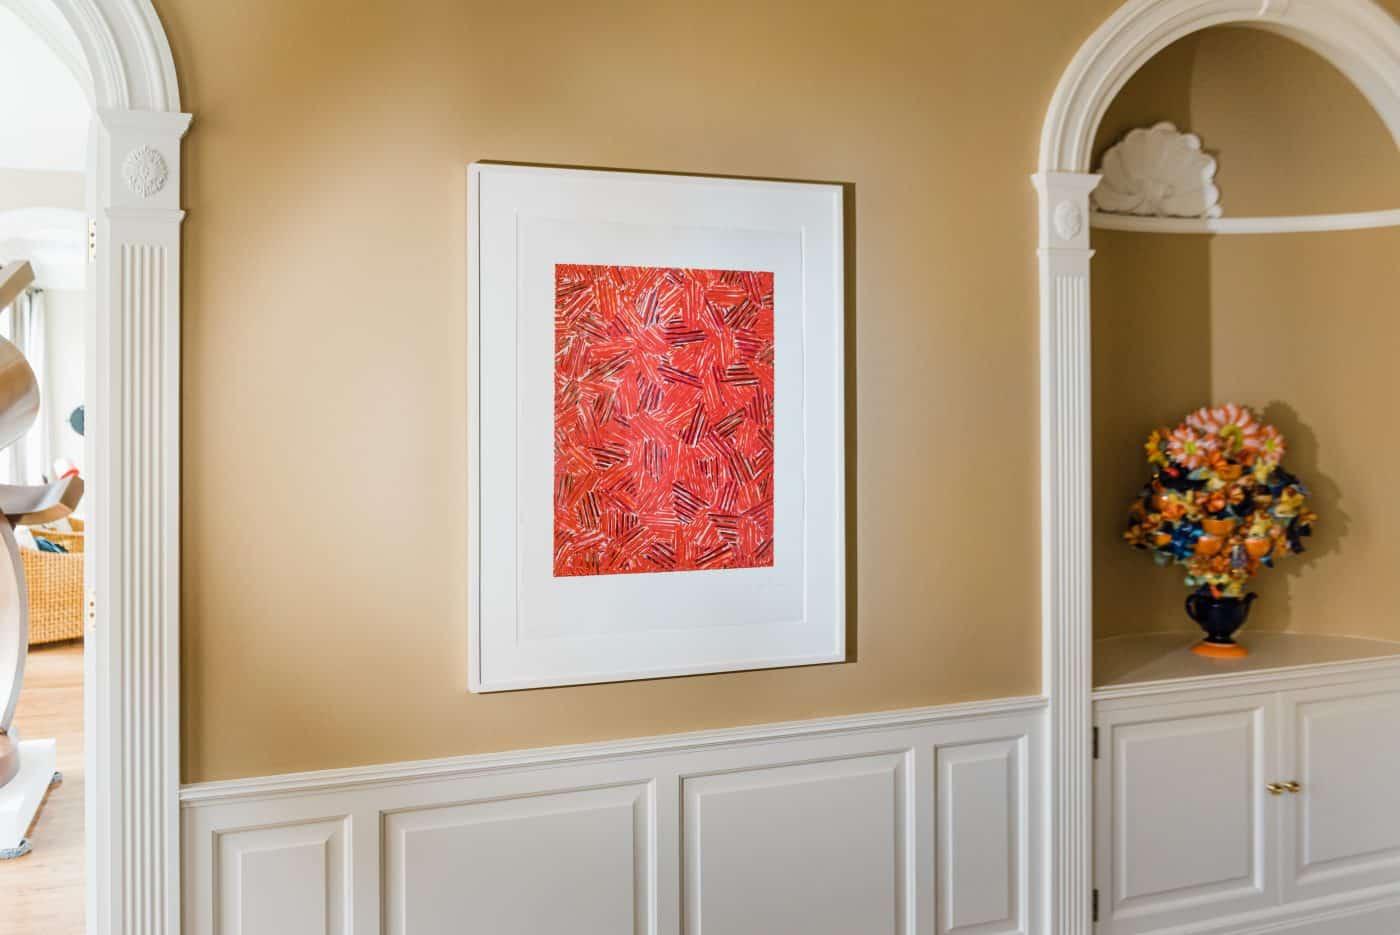 Jordan Schnitzer's home in Portland, Oregon: Cicada, 1981, by Jasper Johns in Schnitzer's dining room.